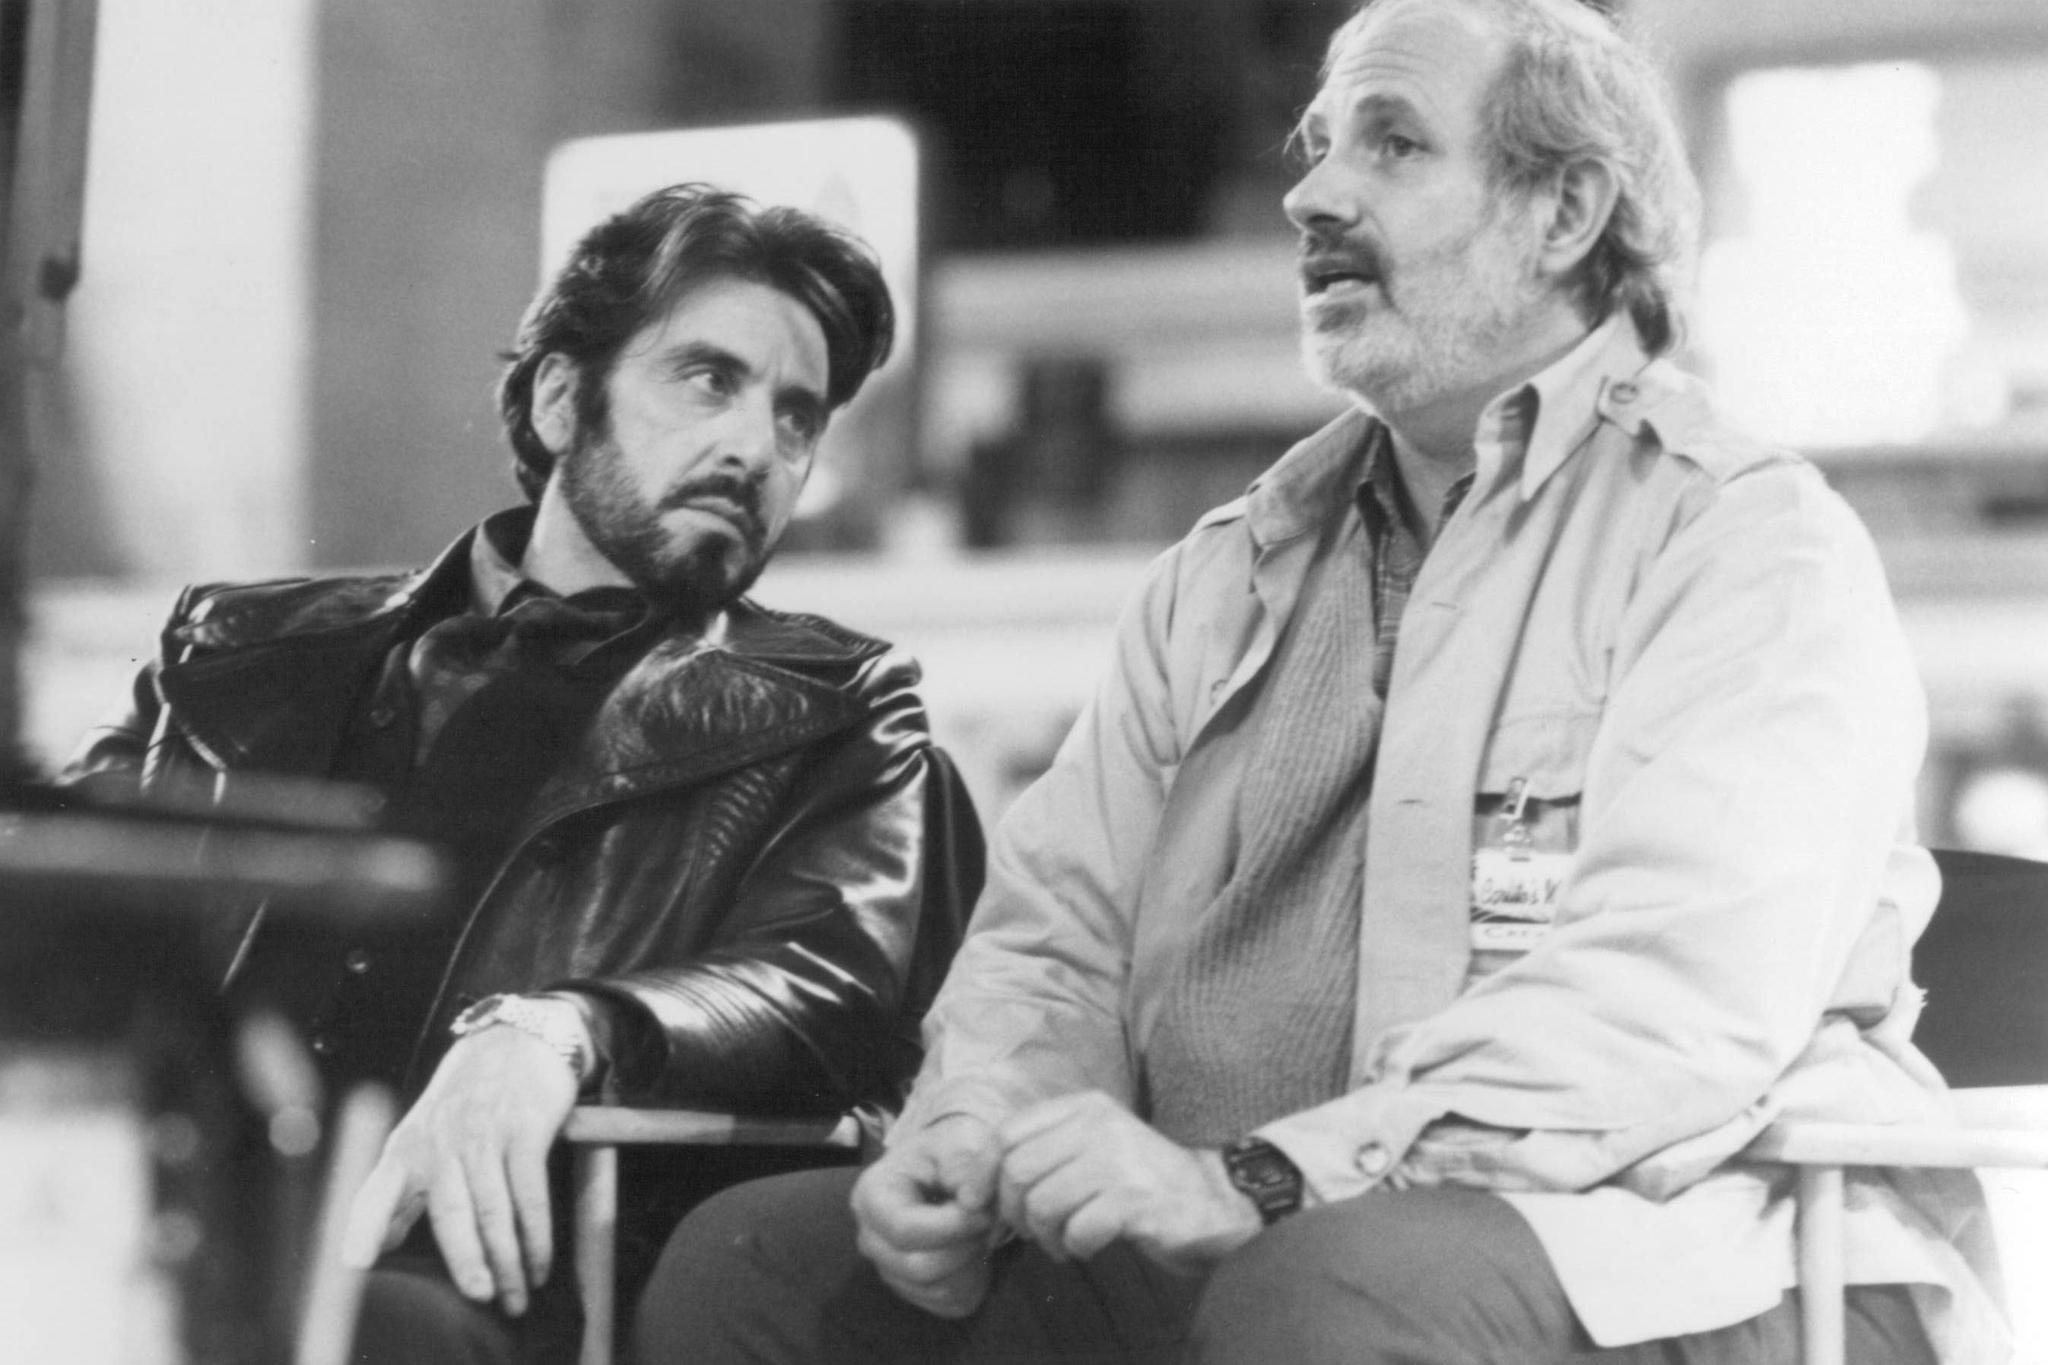 Noah Baumbach and Jake Paltrow Geek Out About Brian De Palma